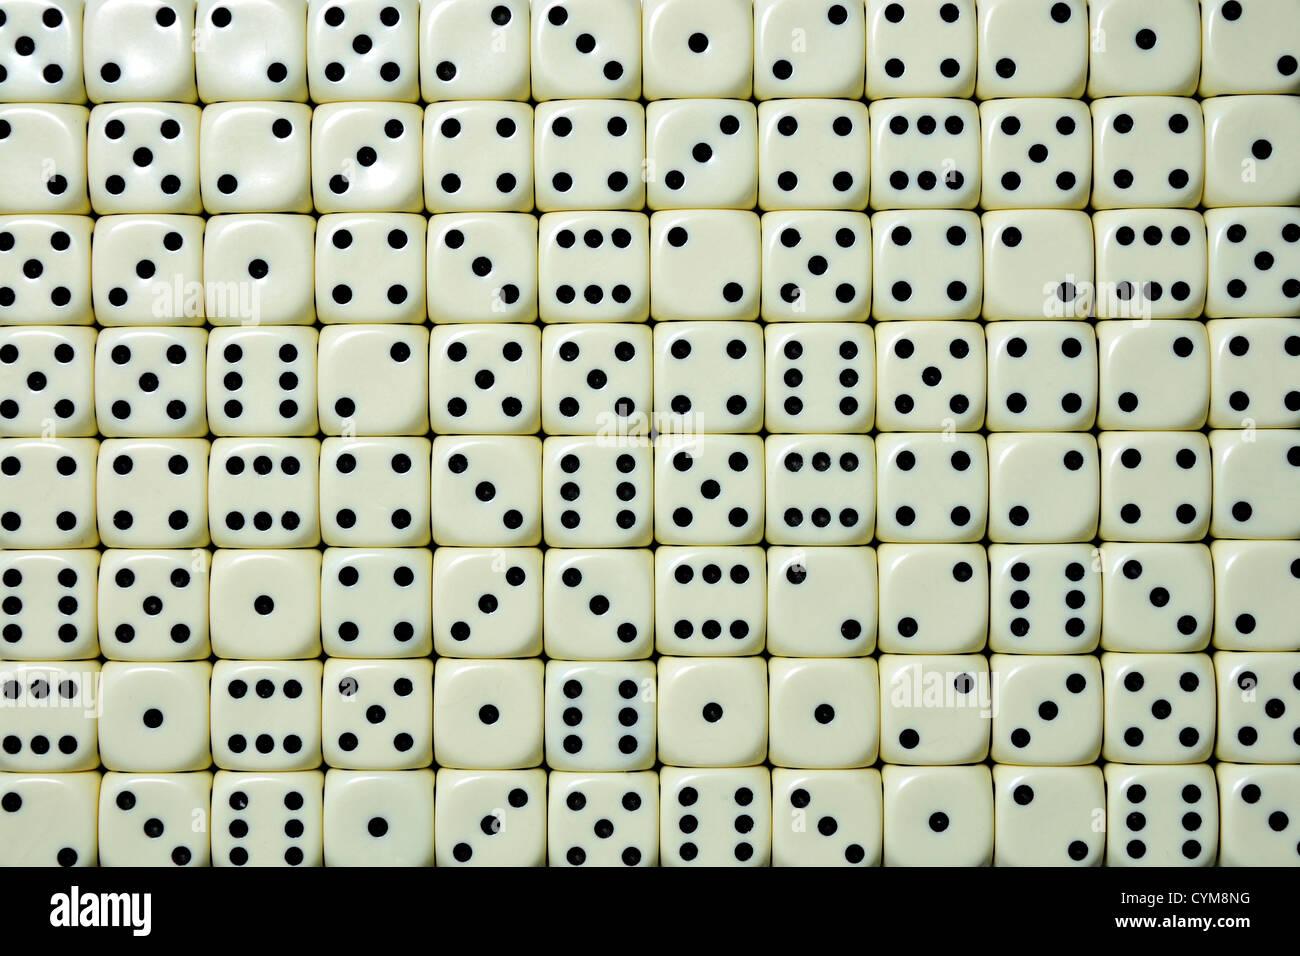 Dice - random numbers - Stock Image